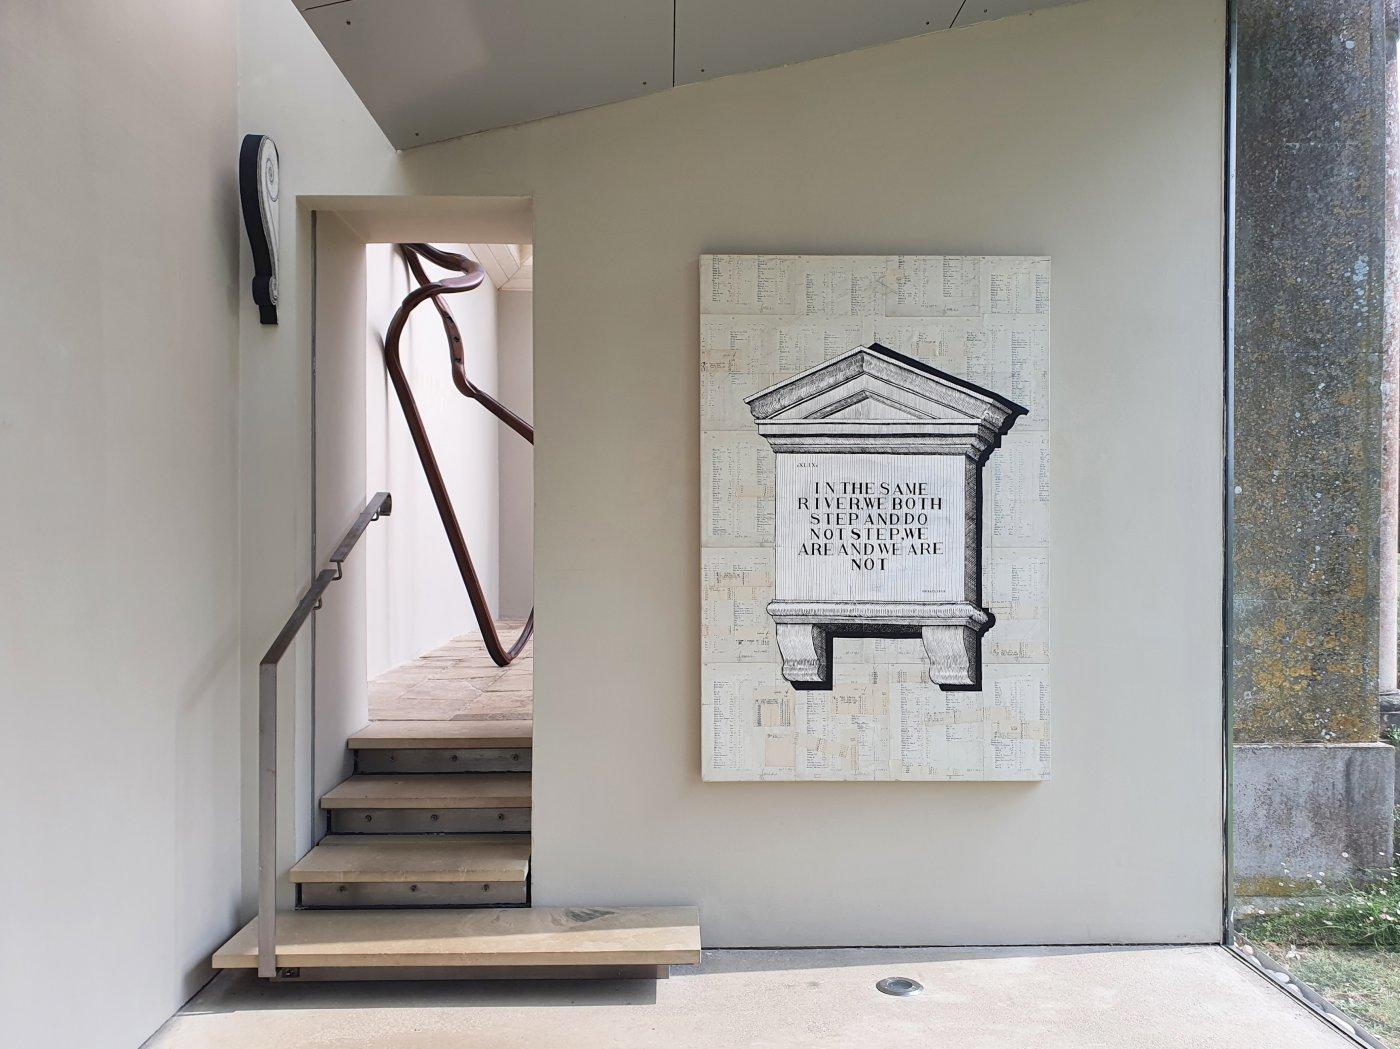 New Art Centre Edward Allington Nika Neelova 10